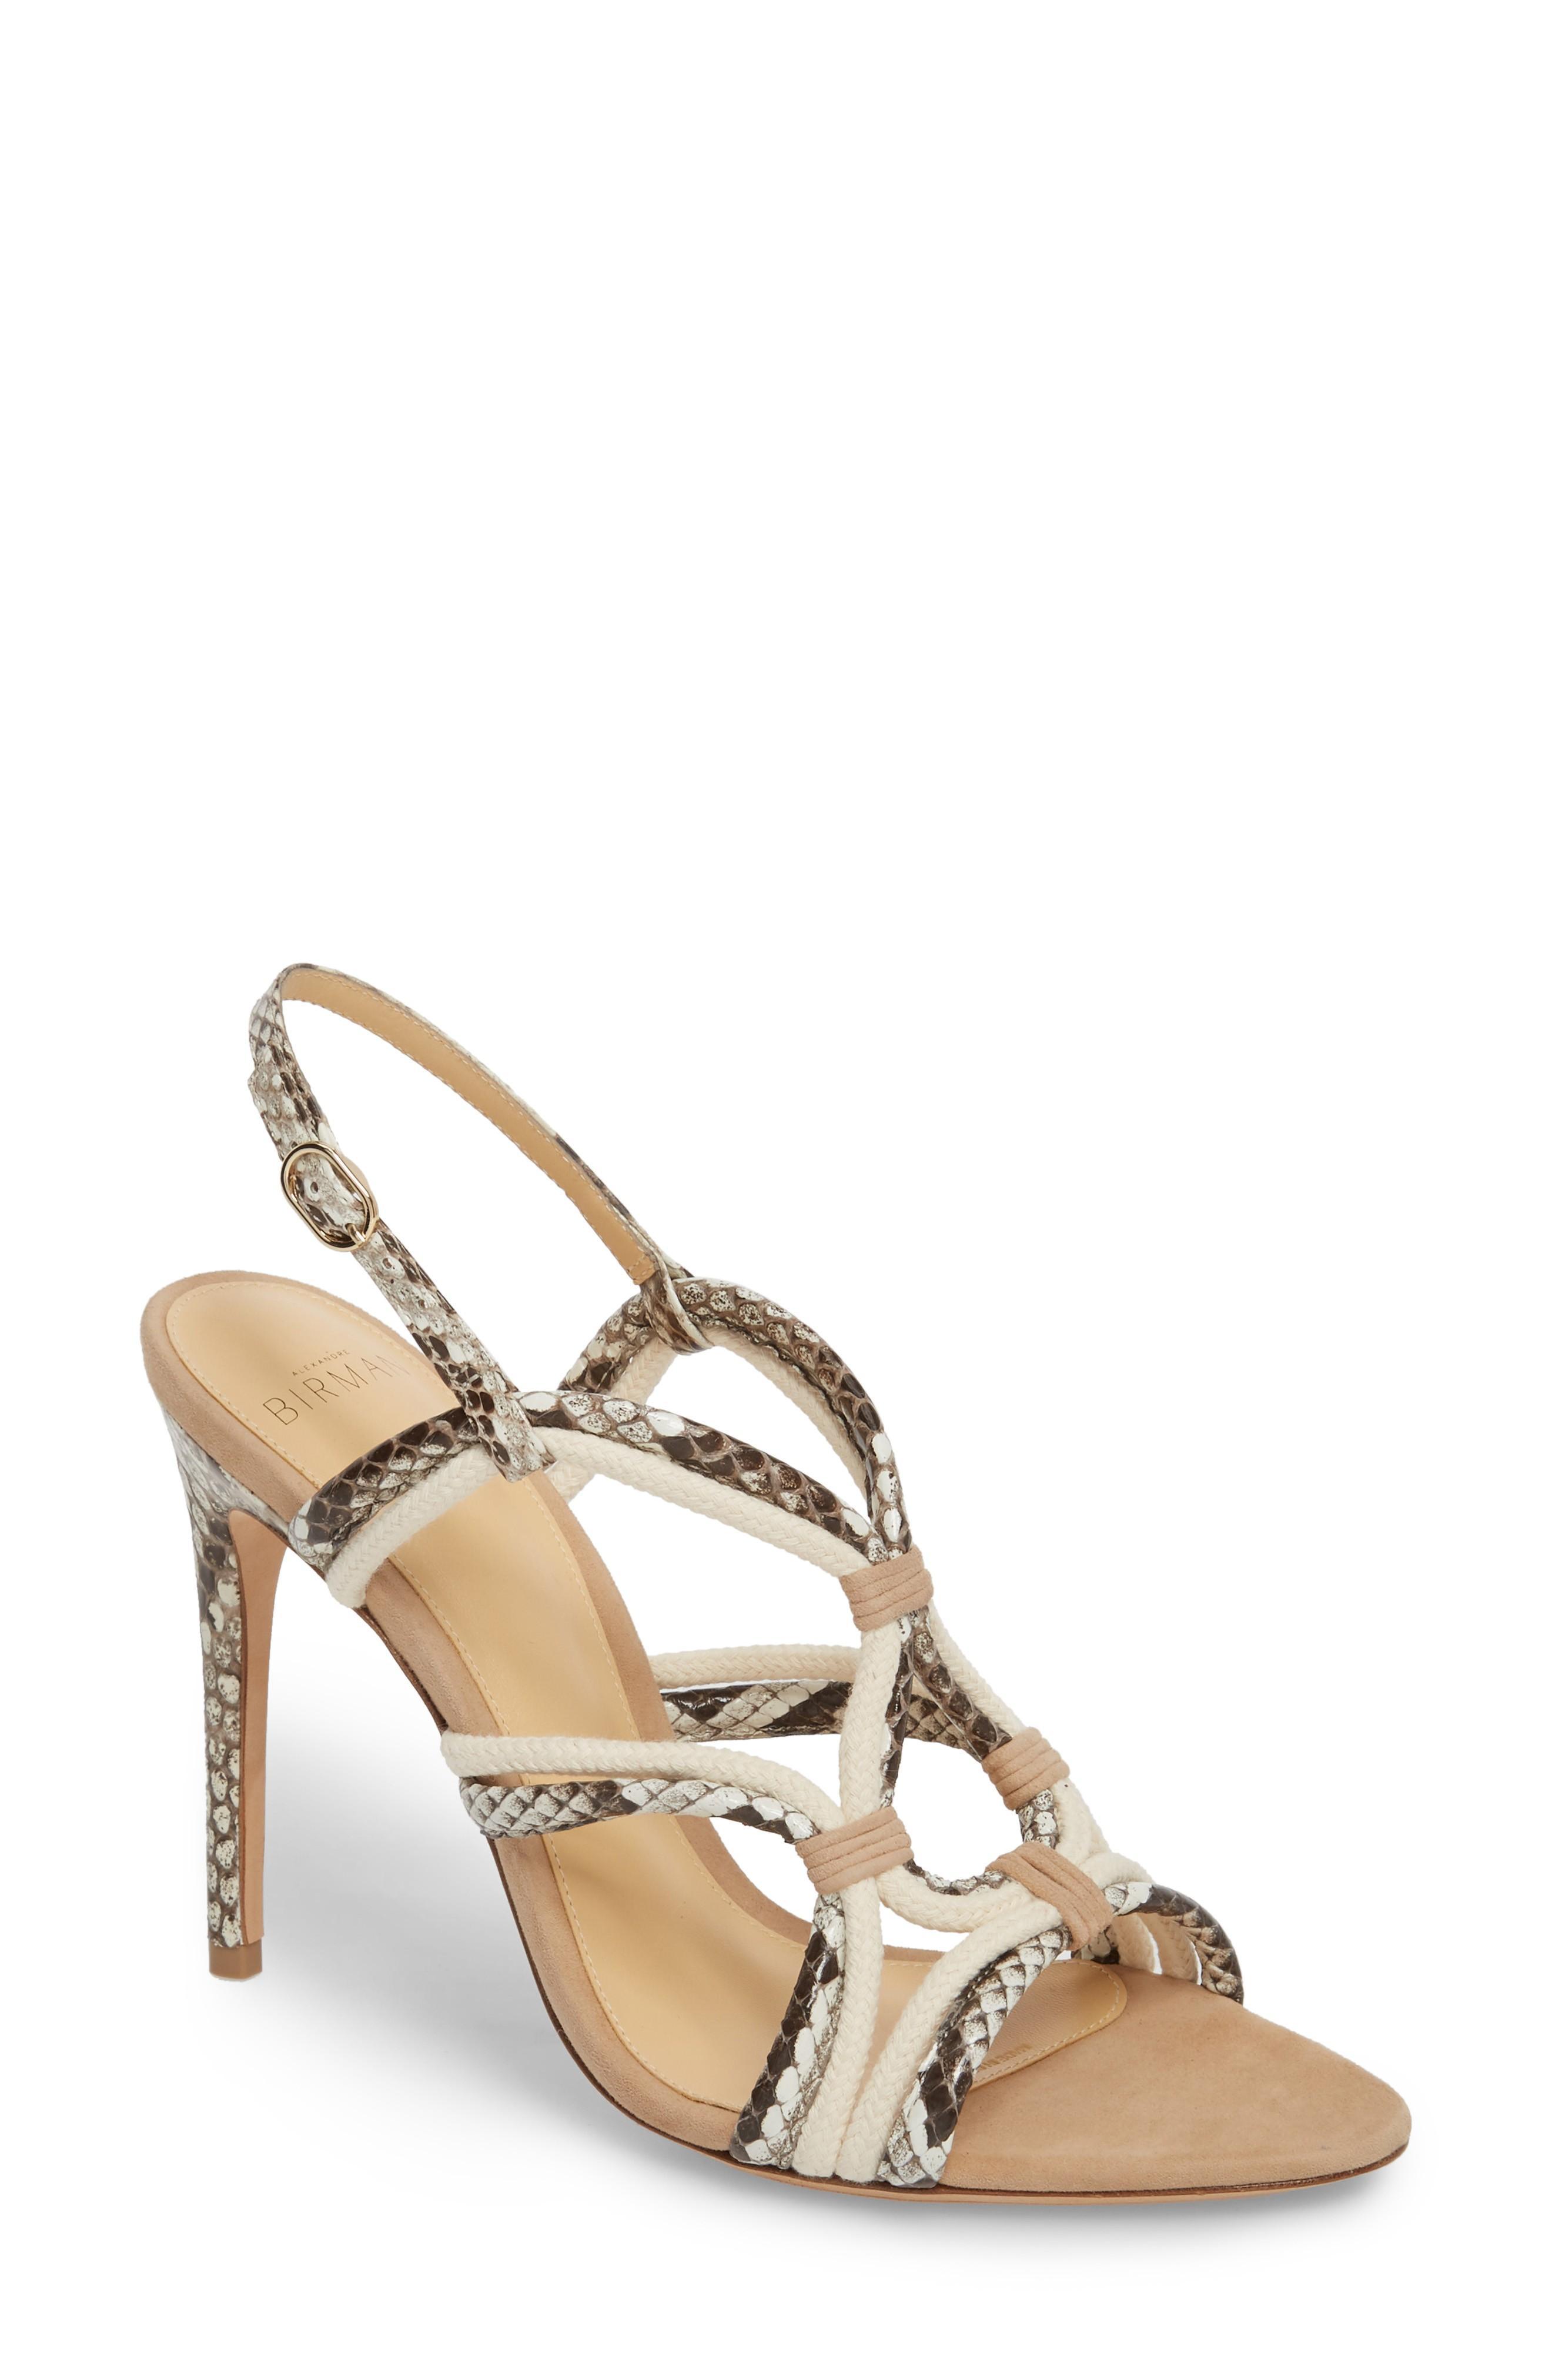 2df8609cf Alexandre Birman Giovanna Genuine Python Sandal In Natural